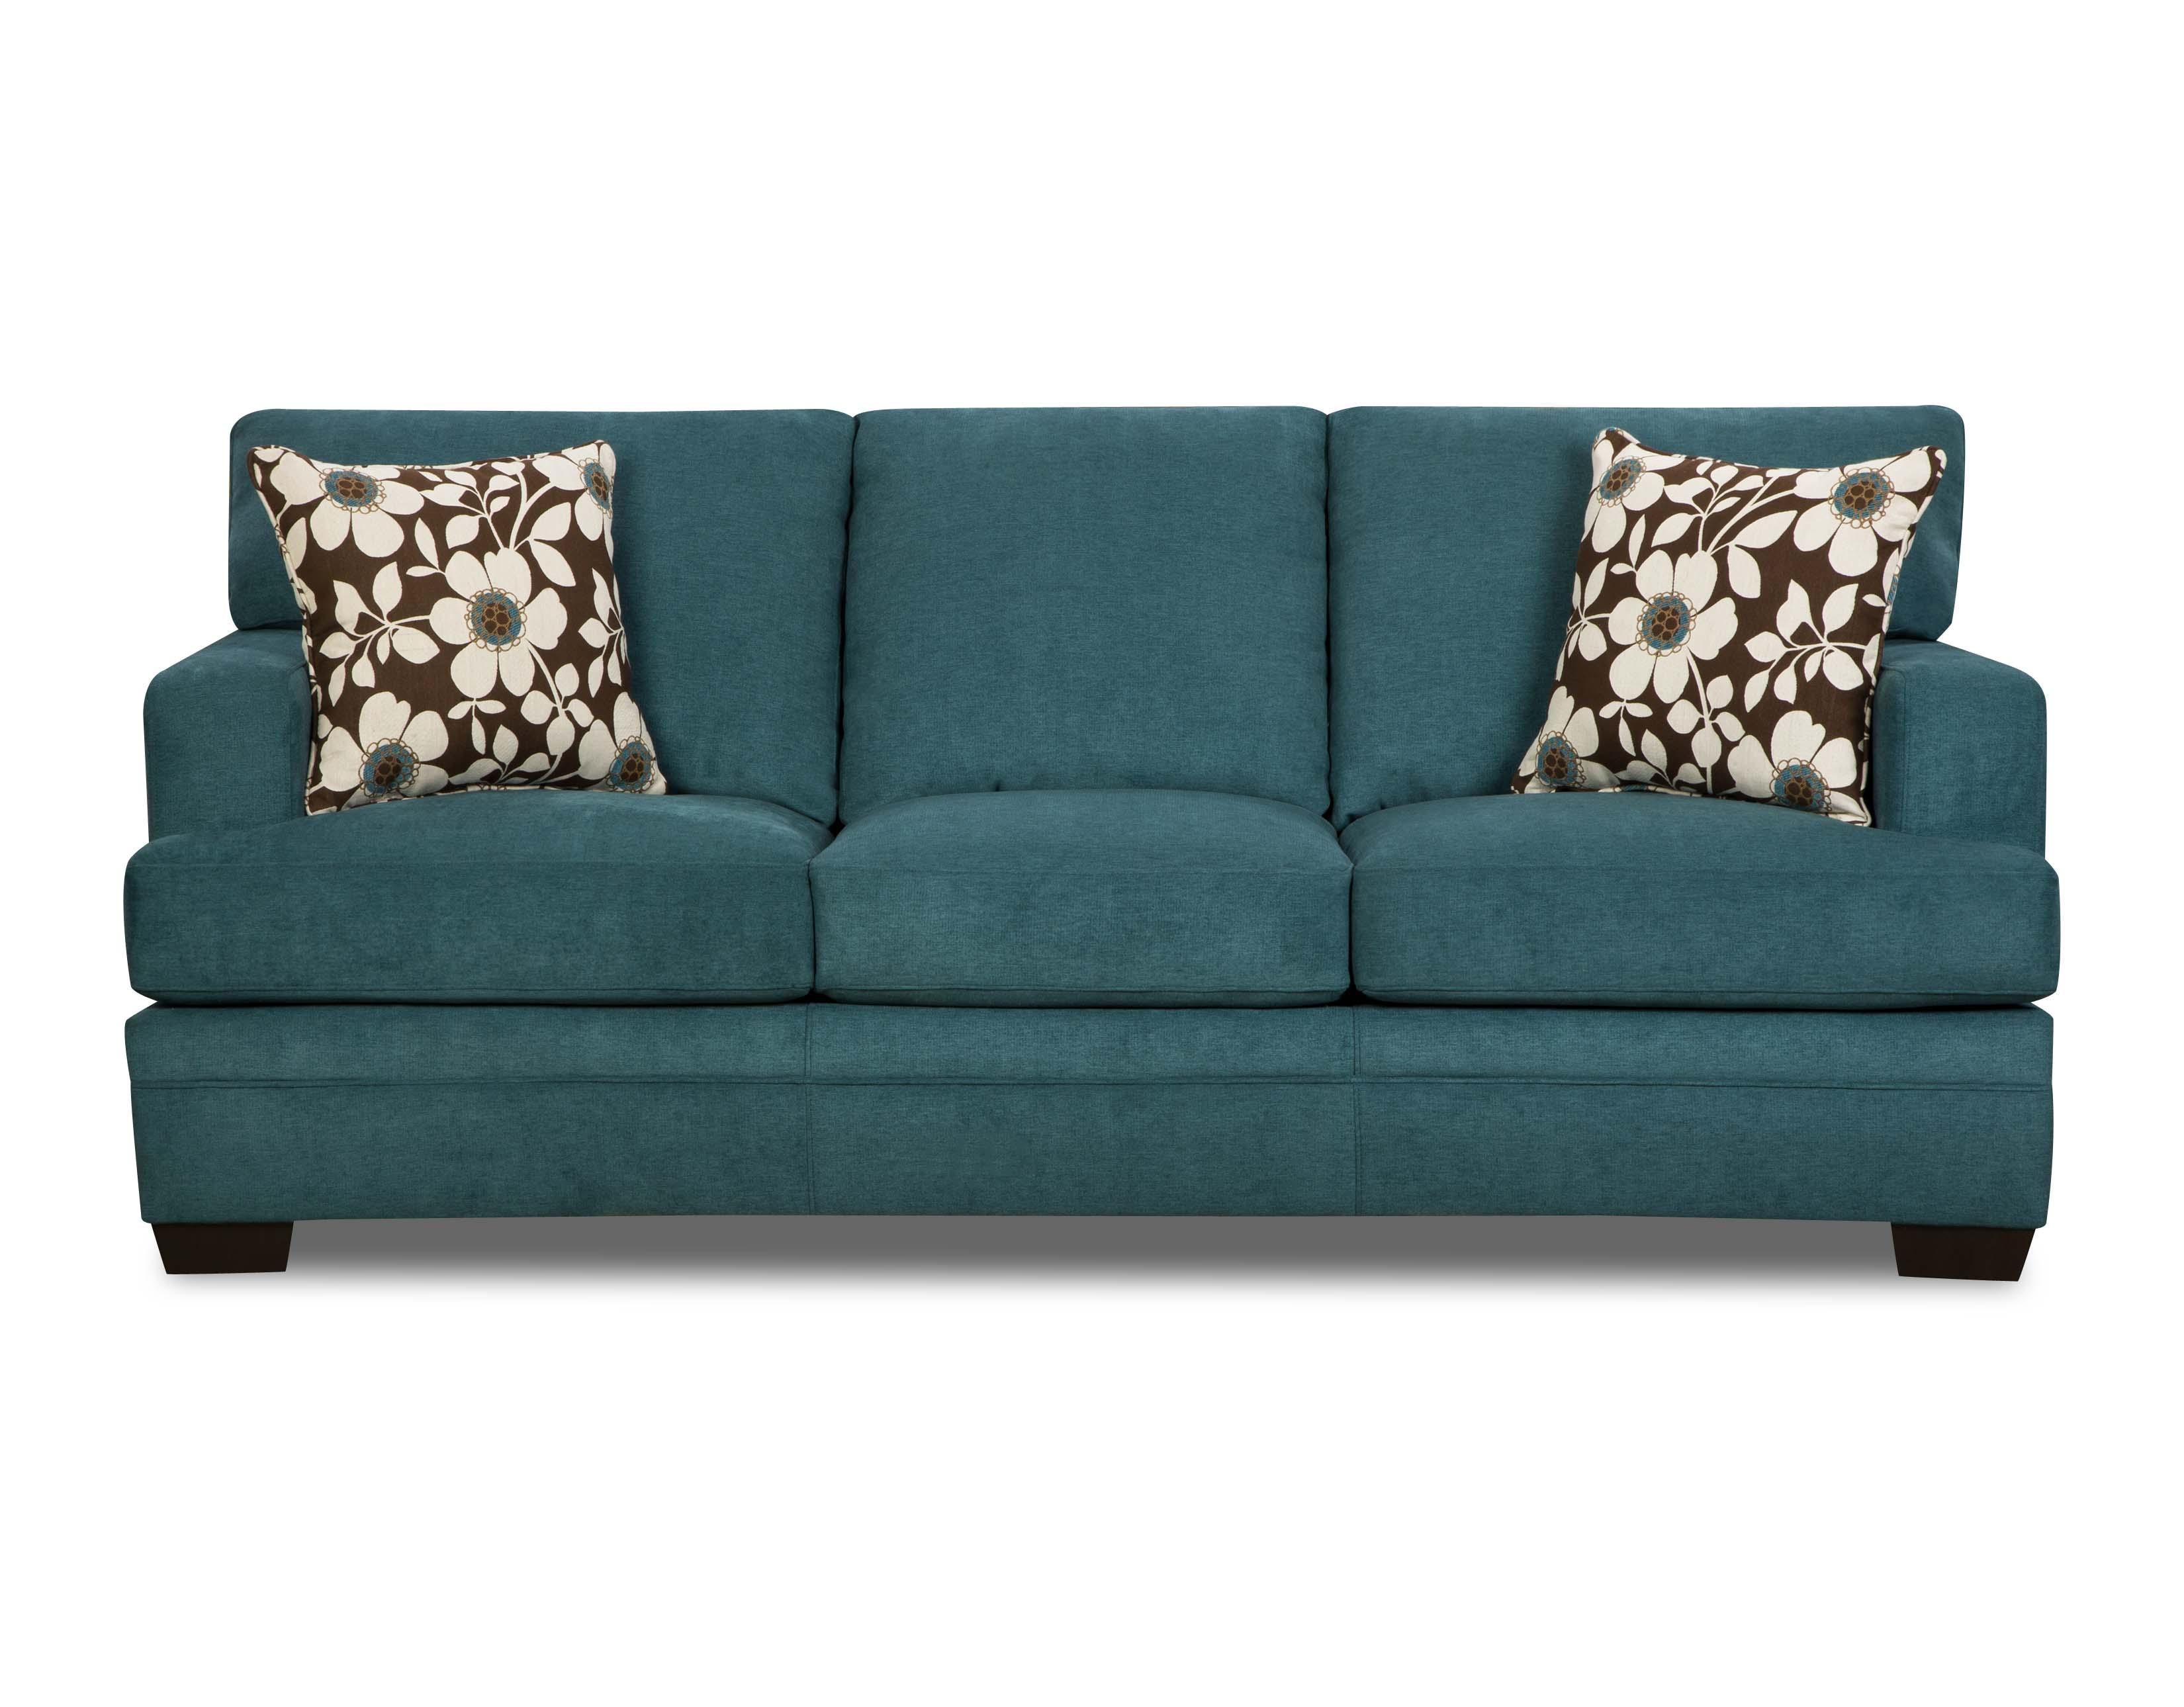 Living room furniture pellis 3 piece living room set mermaid